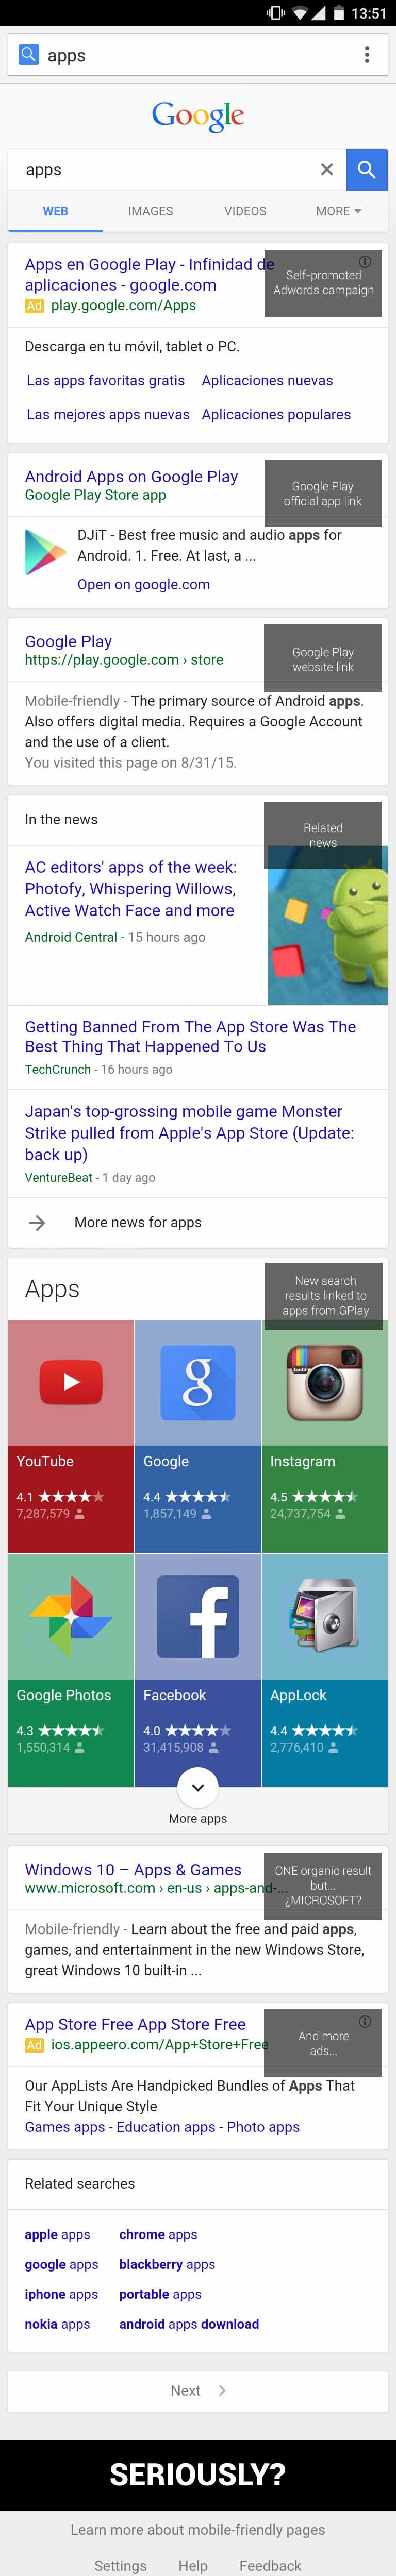 google-play-unfair-22